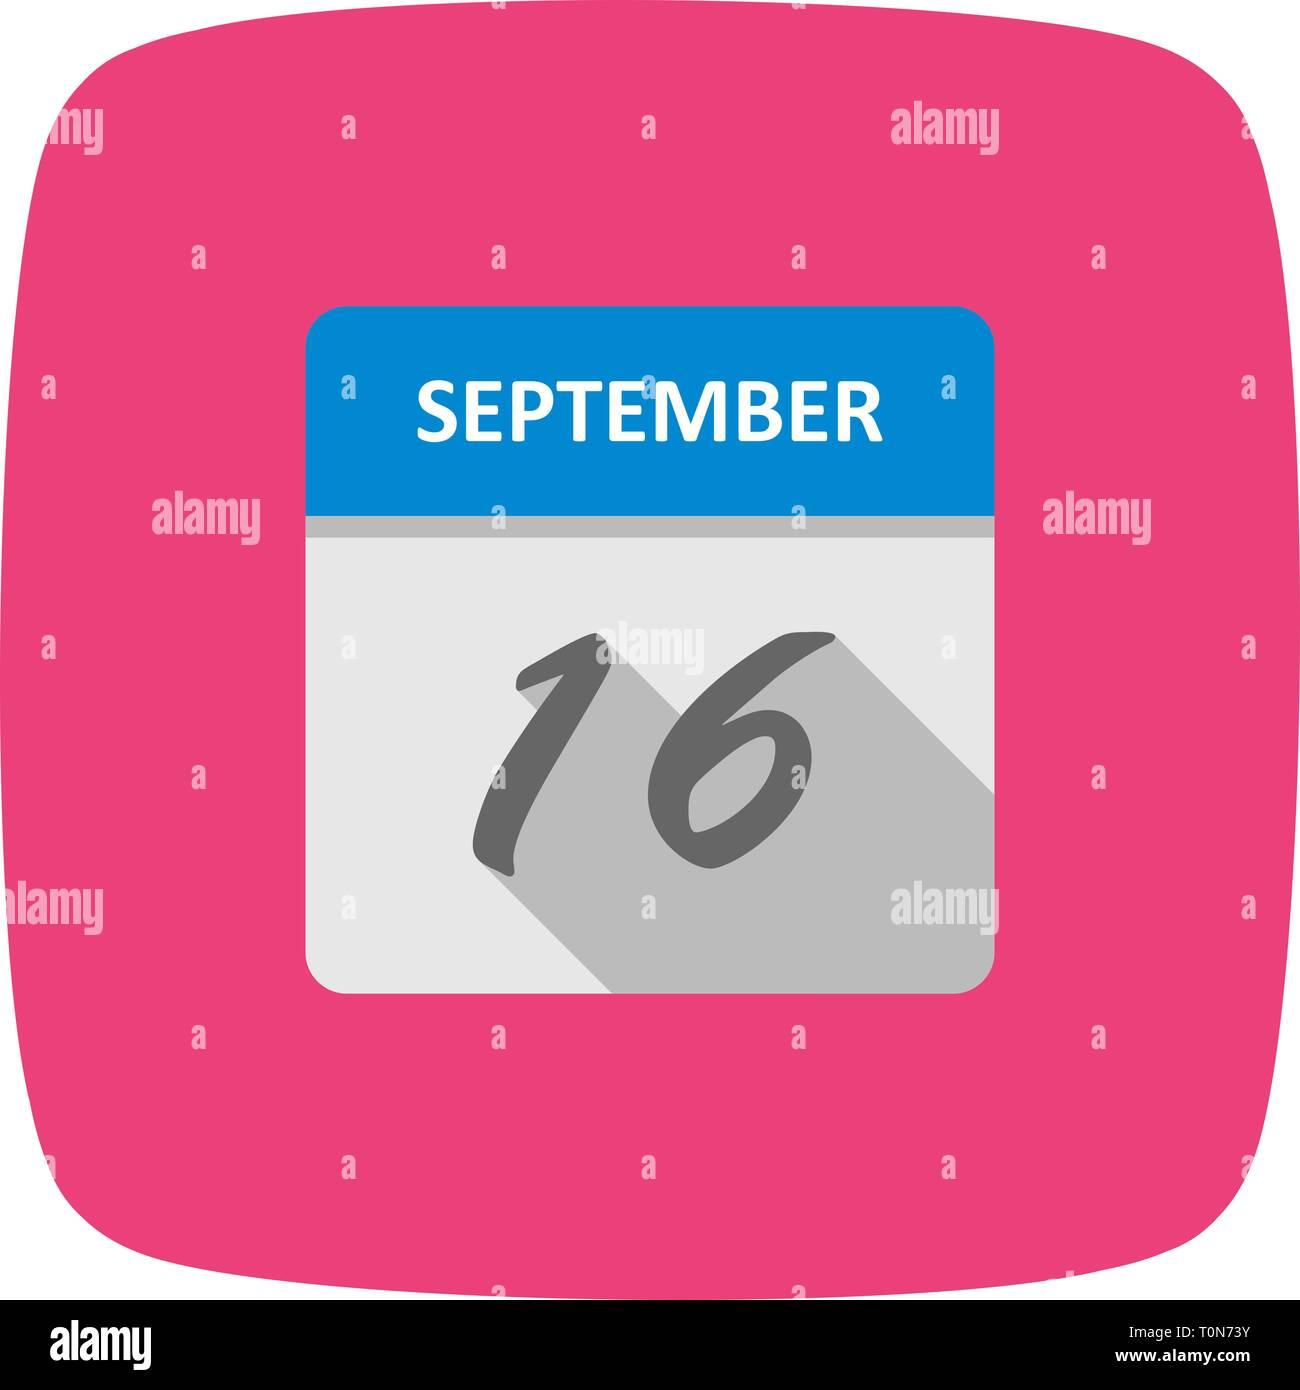 7072a39b75e9 September 16th Date on a Single Day Calendar - Stock Image